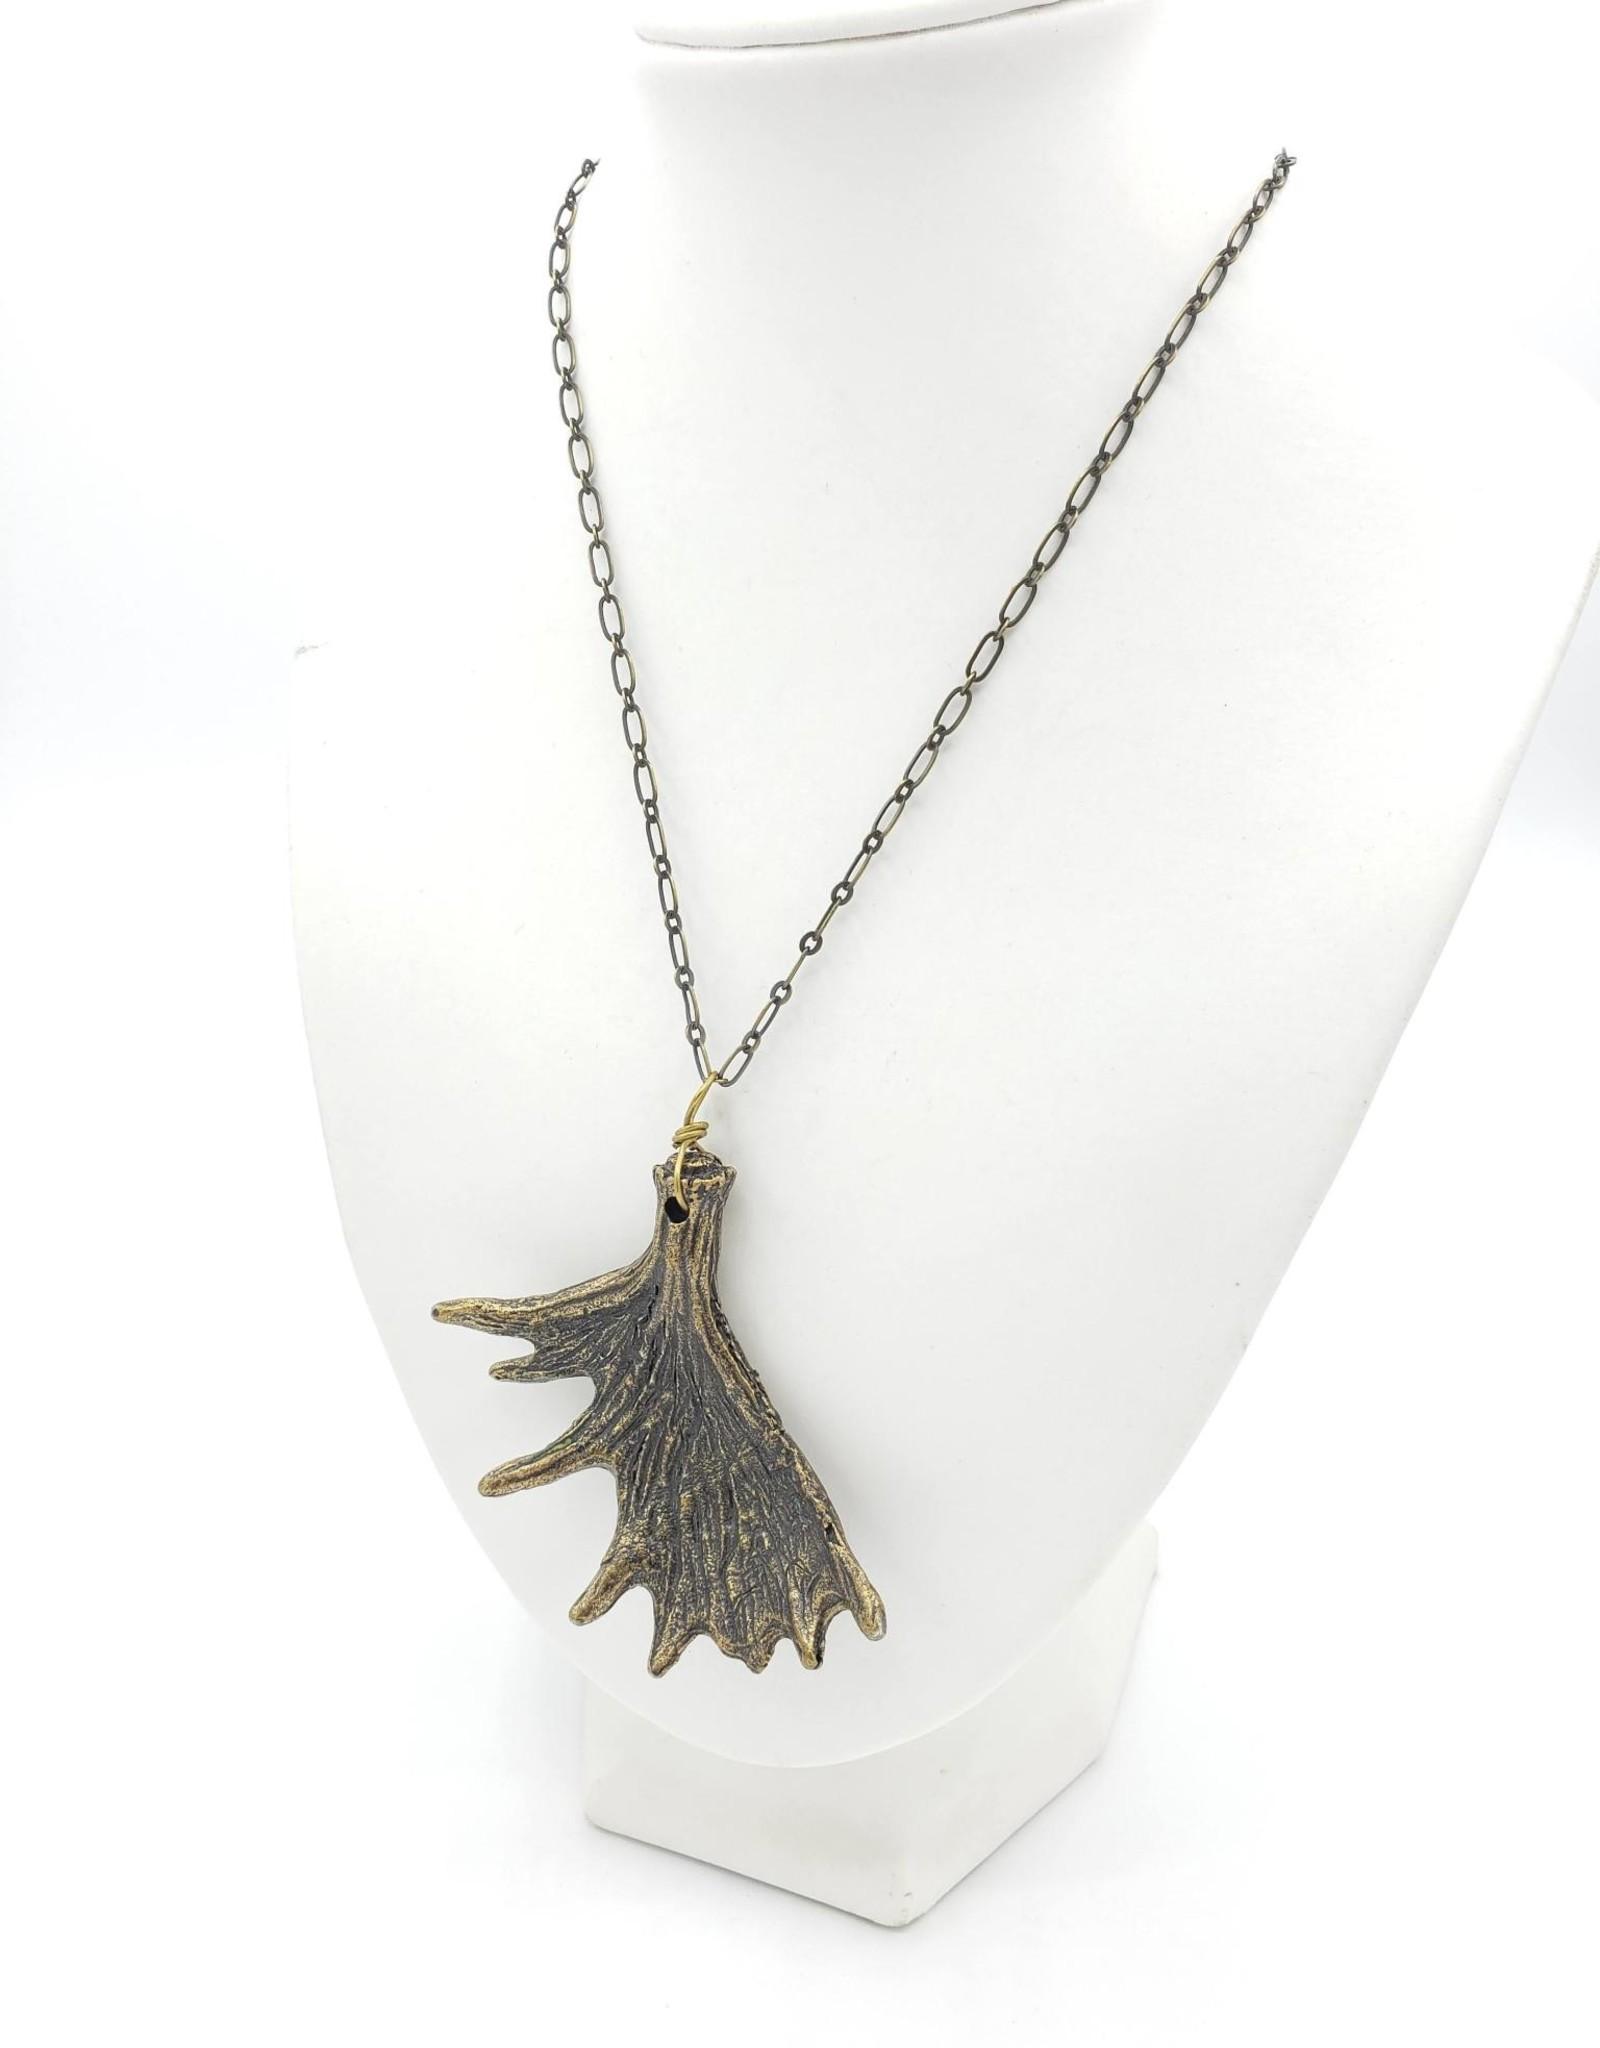 Flea Market Girl Elk antler necklace - by Flea Market Girl